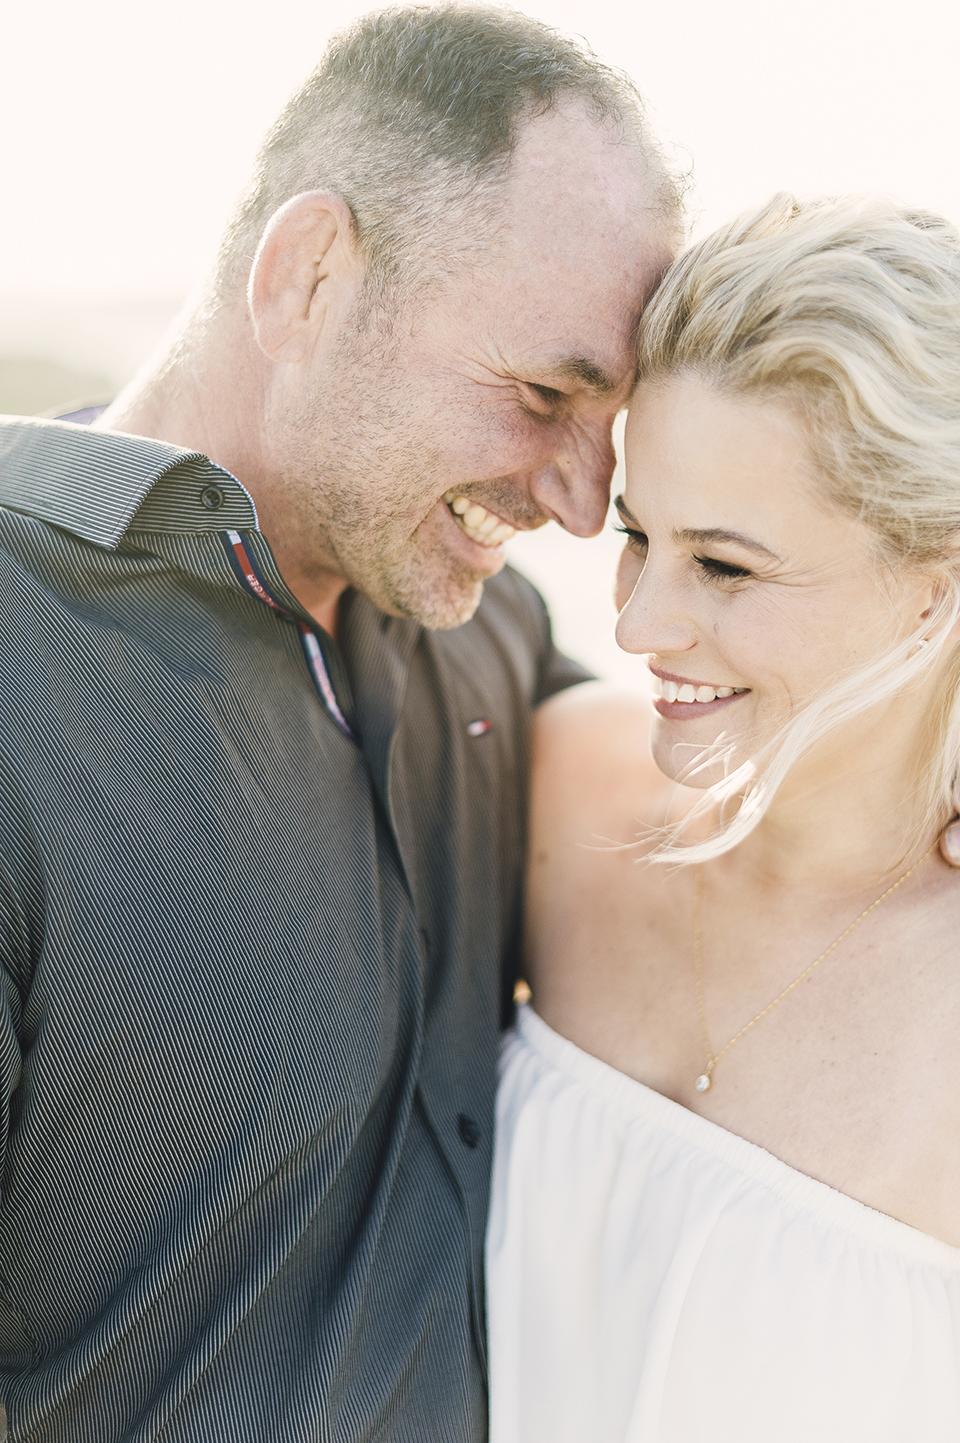 RyanParker_CapeTown_Photographer_Wedding_Hermanus_A&B_DSC_9416.jpg